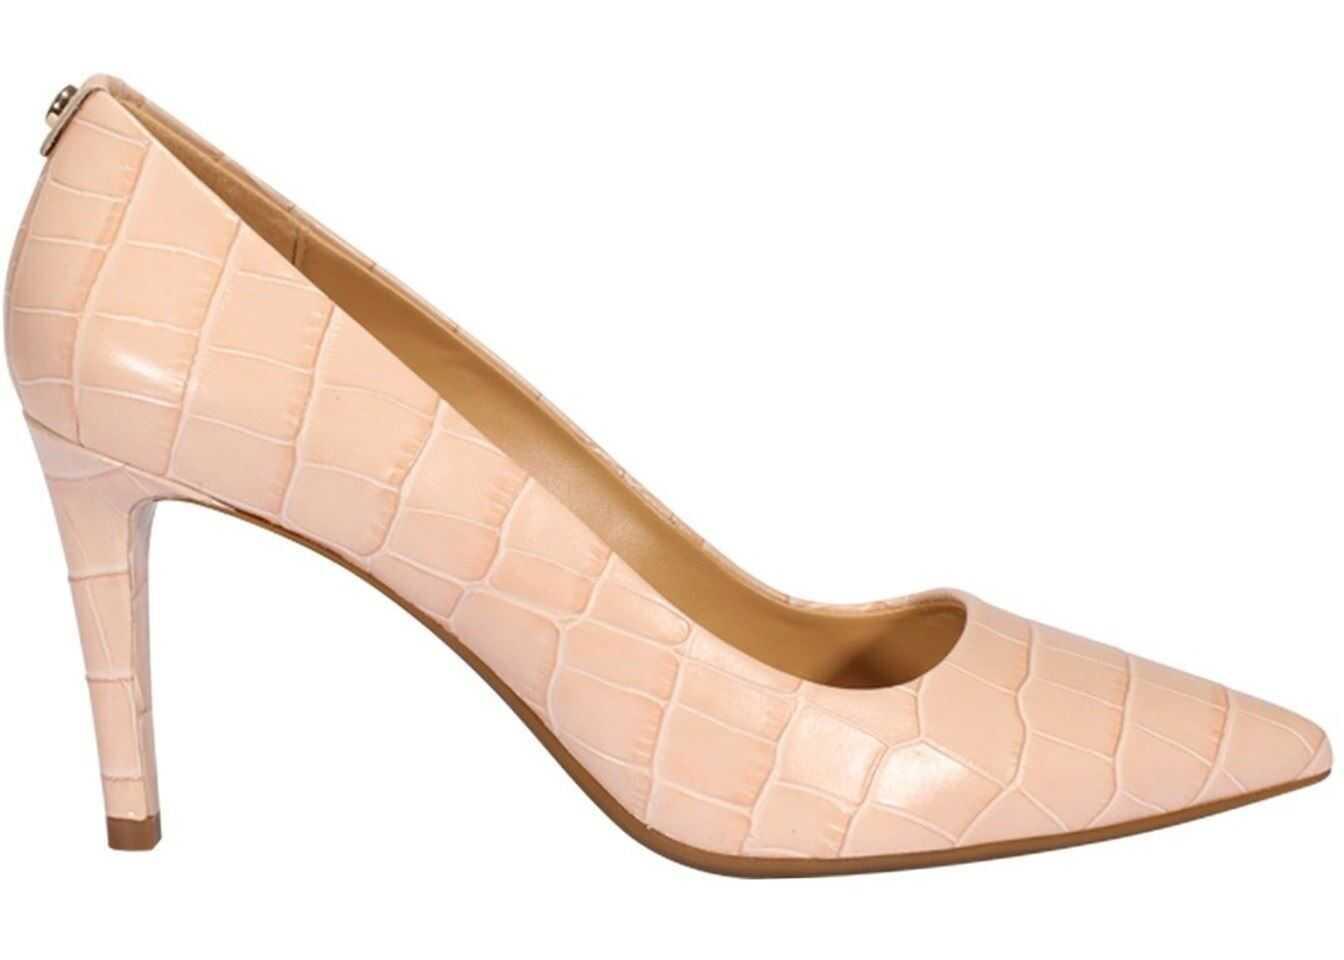 Michael Kors Dorothy Flex Croco Print Leather Pumps Pink